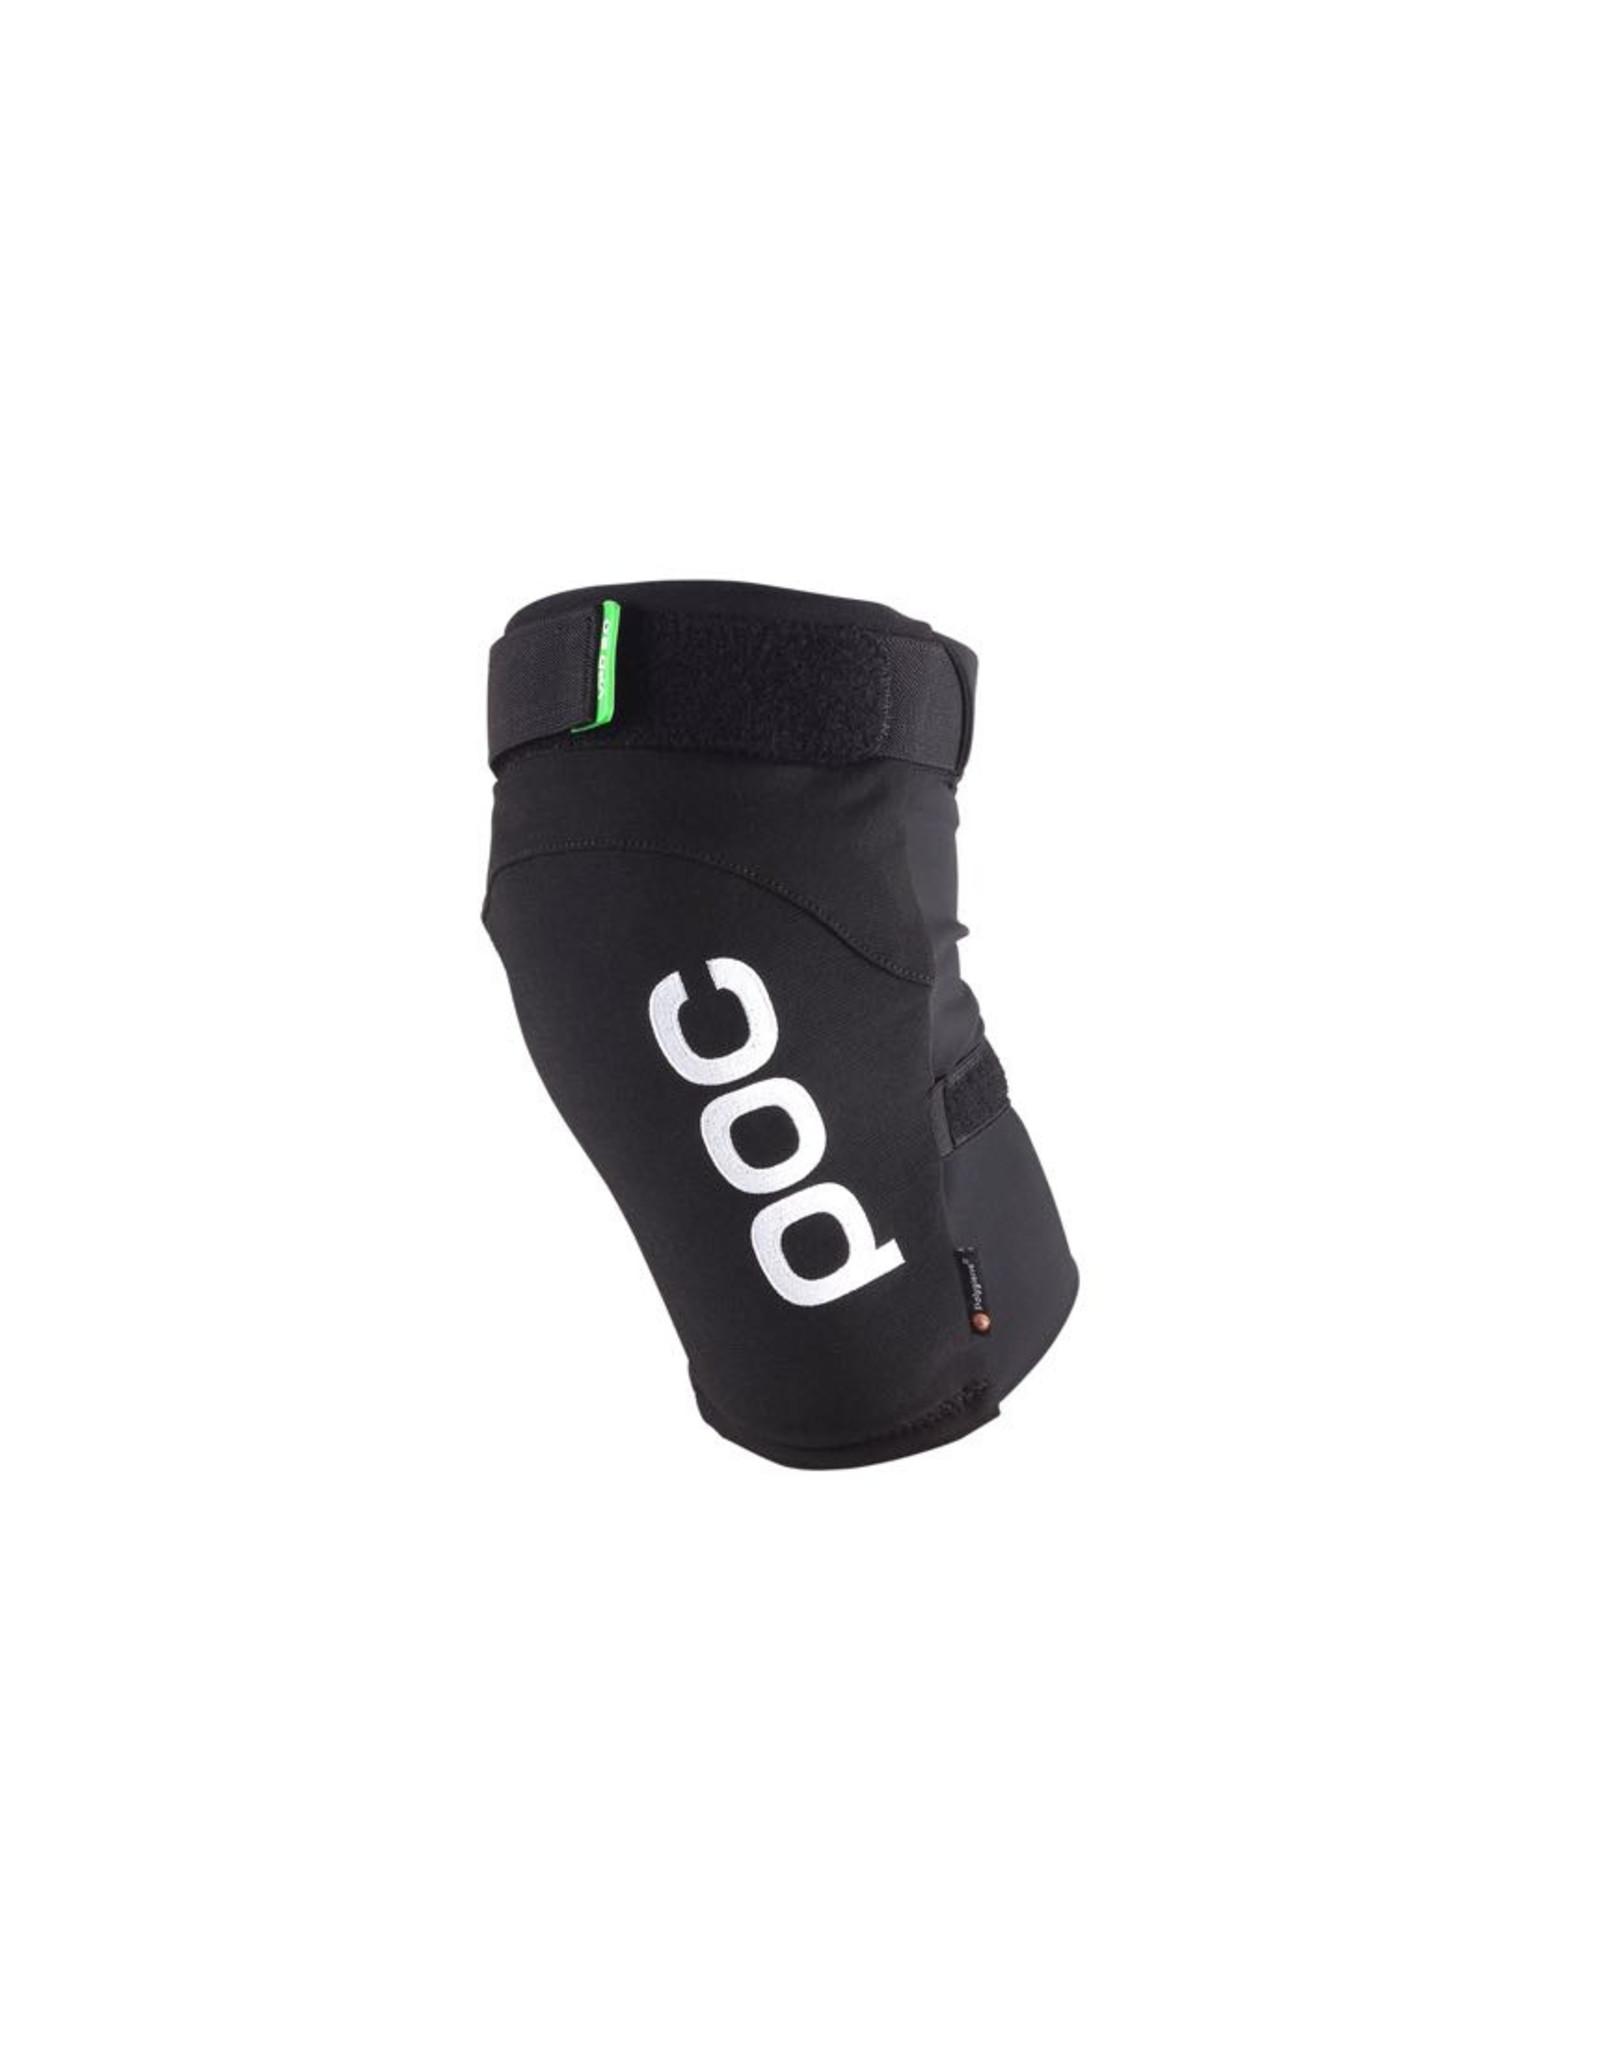 POC POC Joint VPD 2.0 Knee - Size M - Black